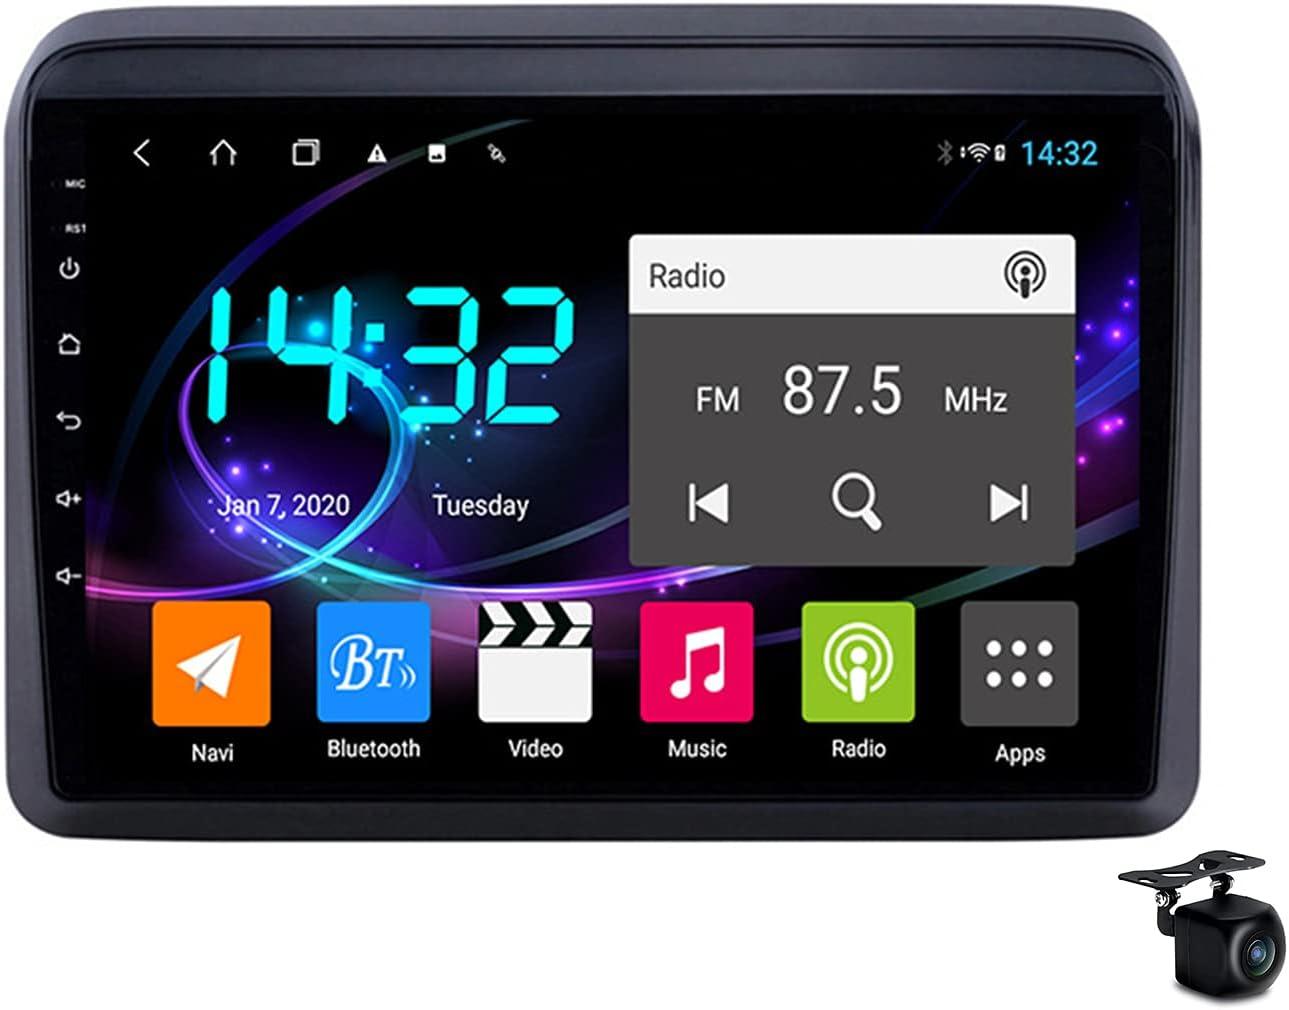 YCJB Car Stereo Android 10.0 Sat Nav for Suzuki Ertiga 2018-2021 GPS Navigation 9'' Headunit MP5 Multimedia Video Player FM Radio Receiver with 4G 5G WiFi SWC Carplay,4core WiFi 1+16gb